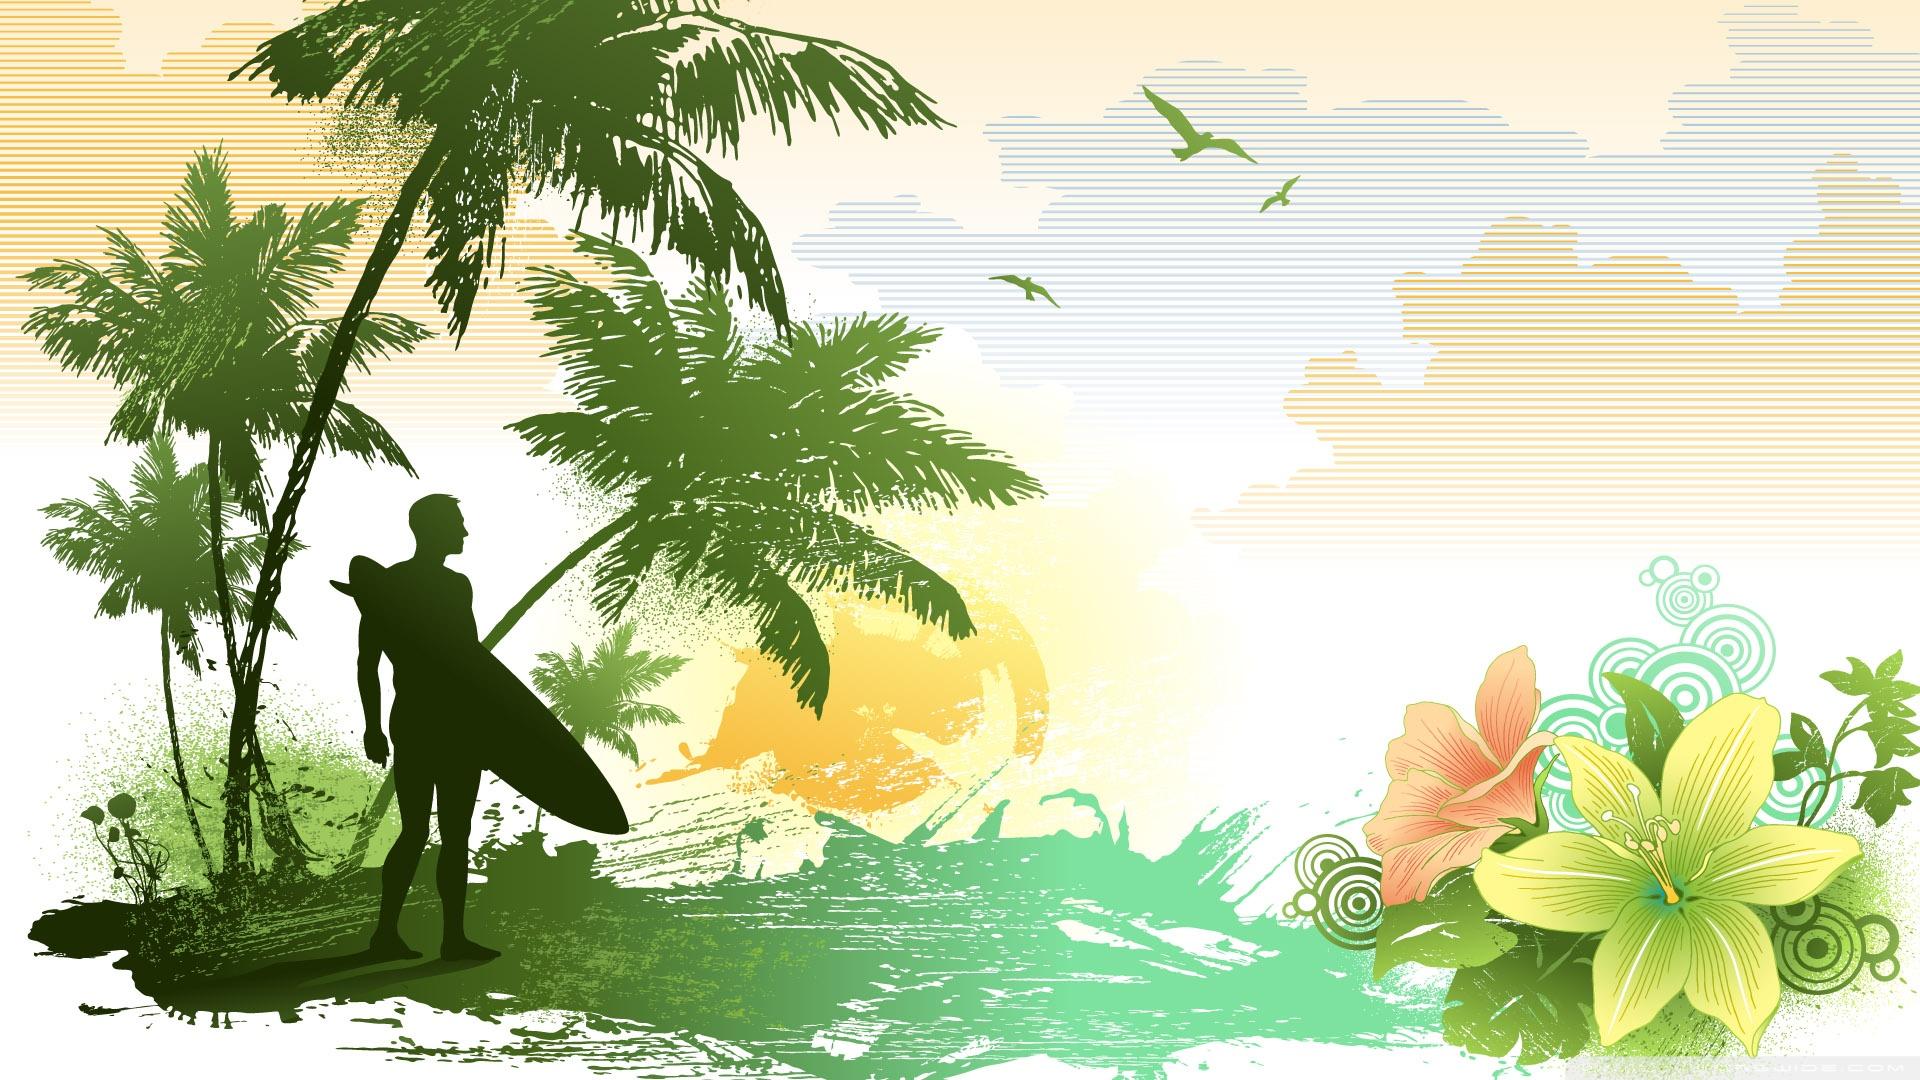 Surfing HD Wallpaper   Wallpaper High Definition High Quality 1920x1080